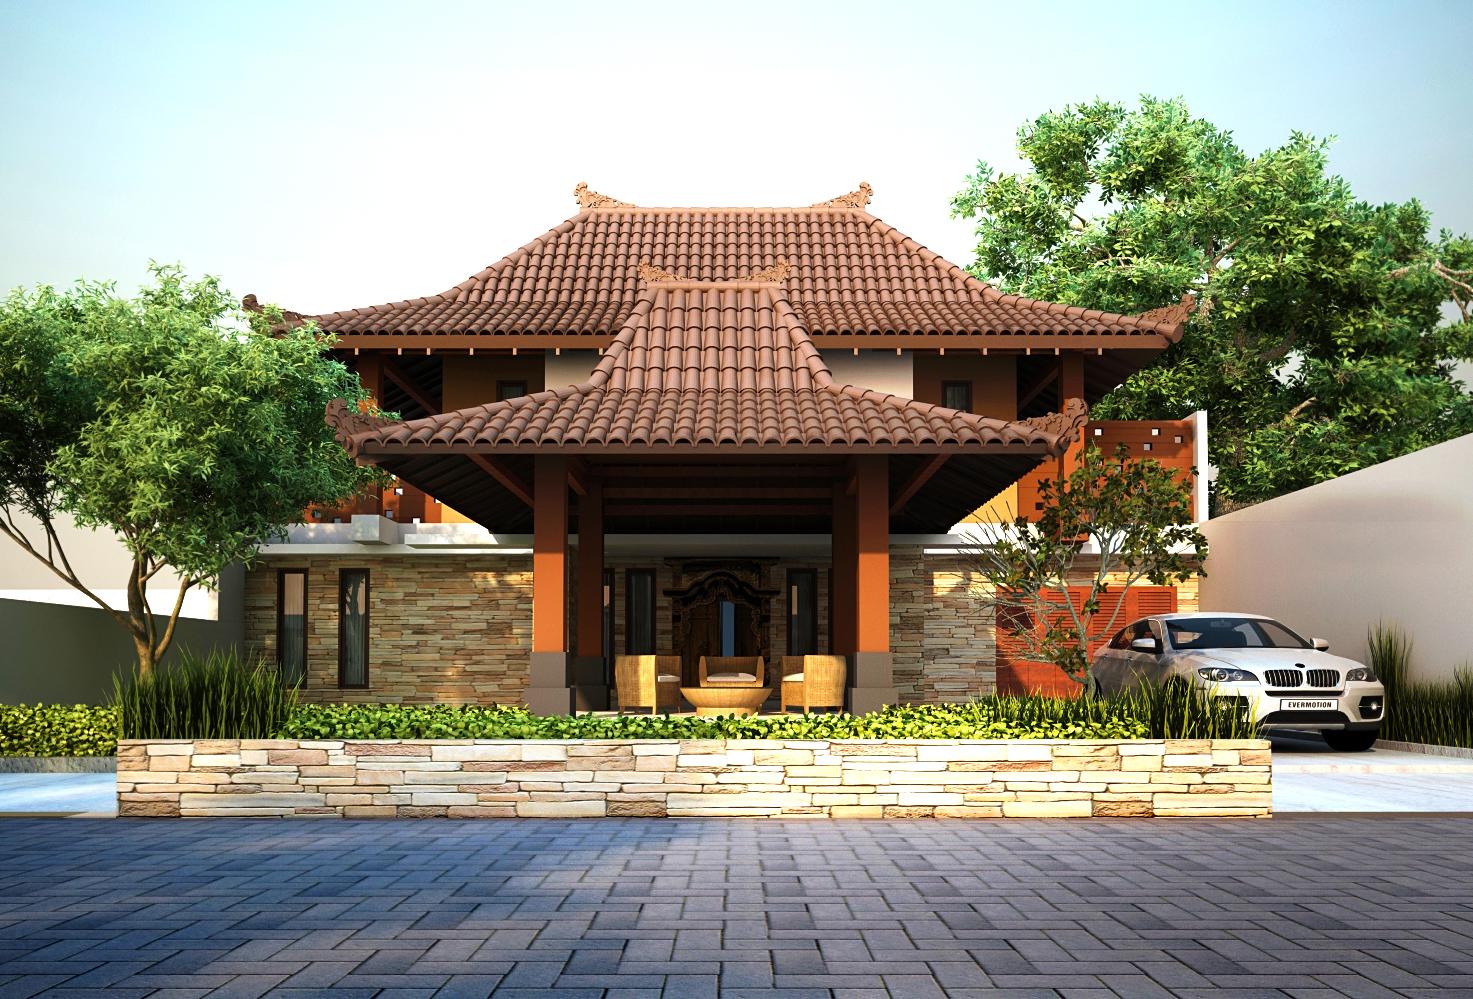 Arsitek IMAjinasi RUmah Studio EKLEKTIK Joglo Pendopo Jagong